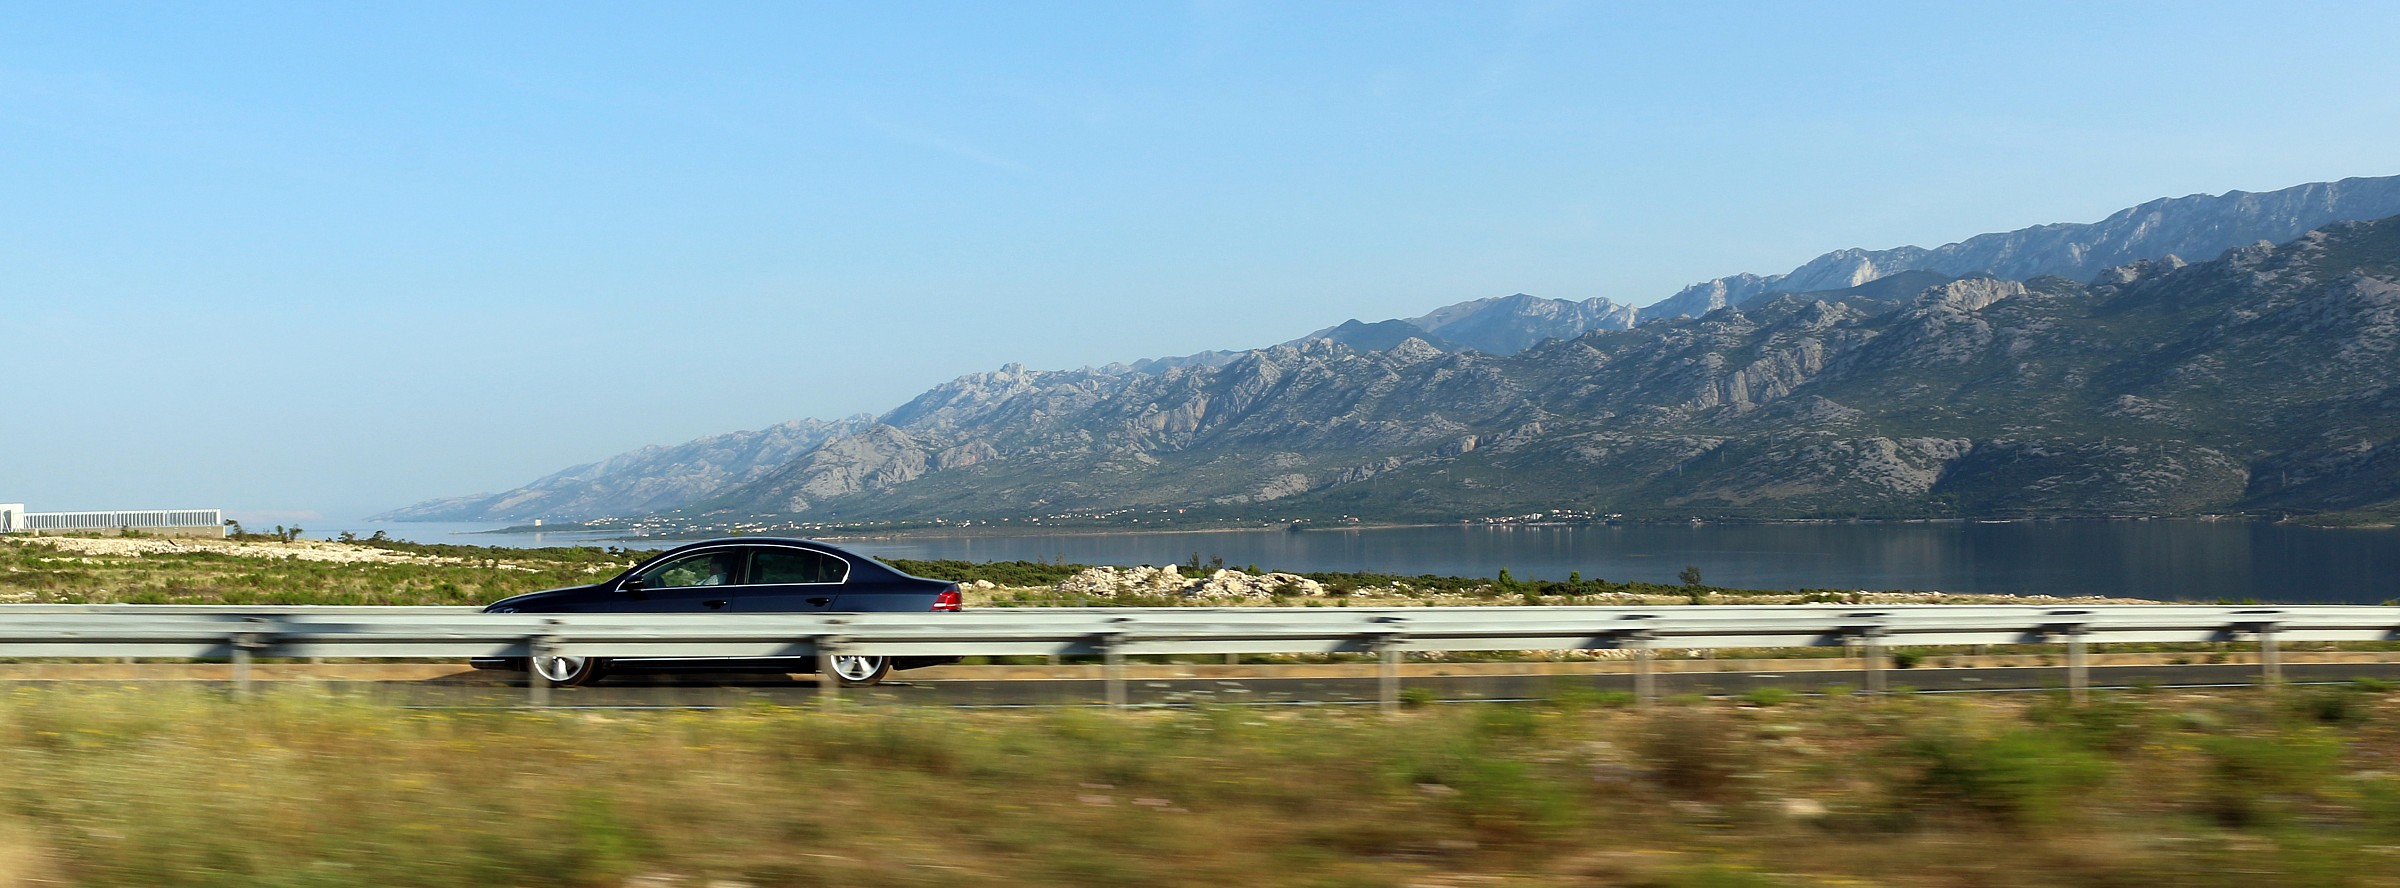 The hills of Zadar...